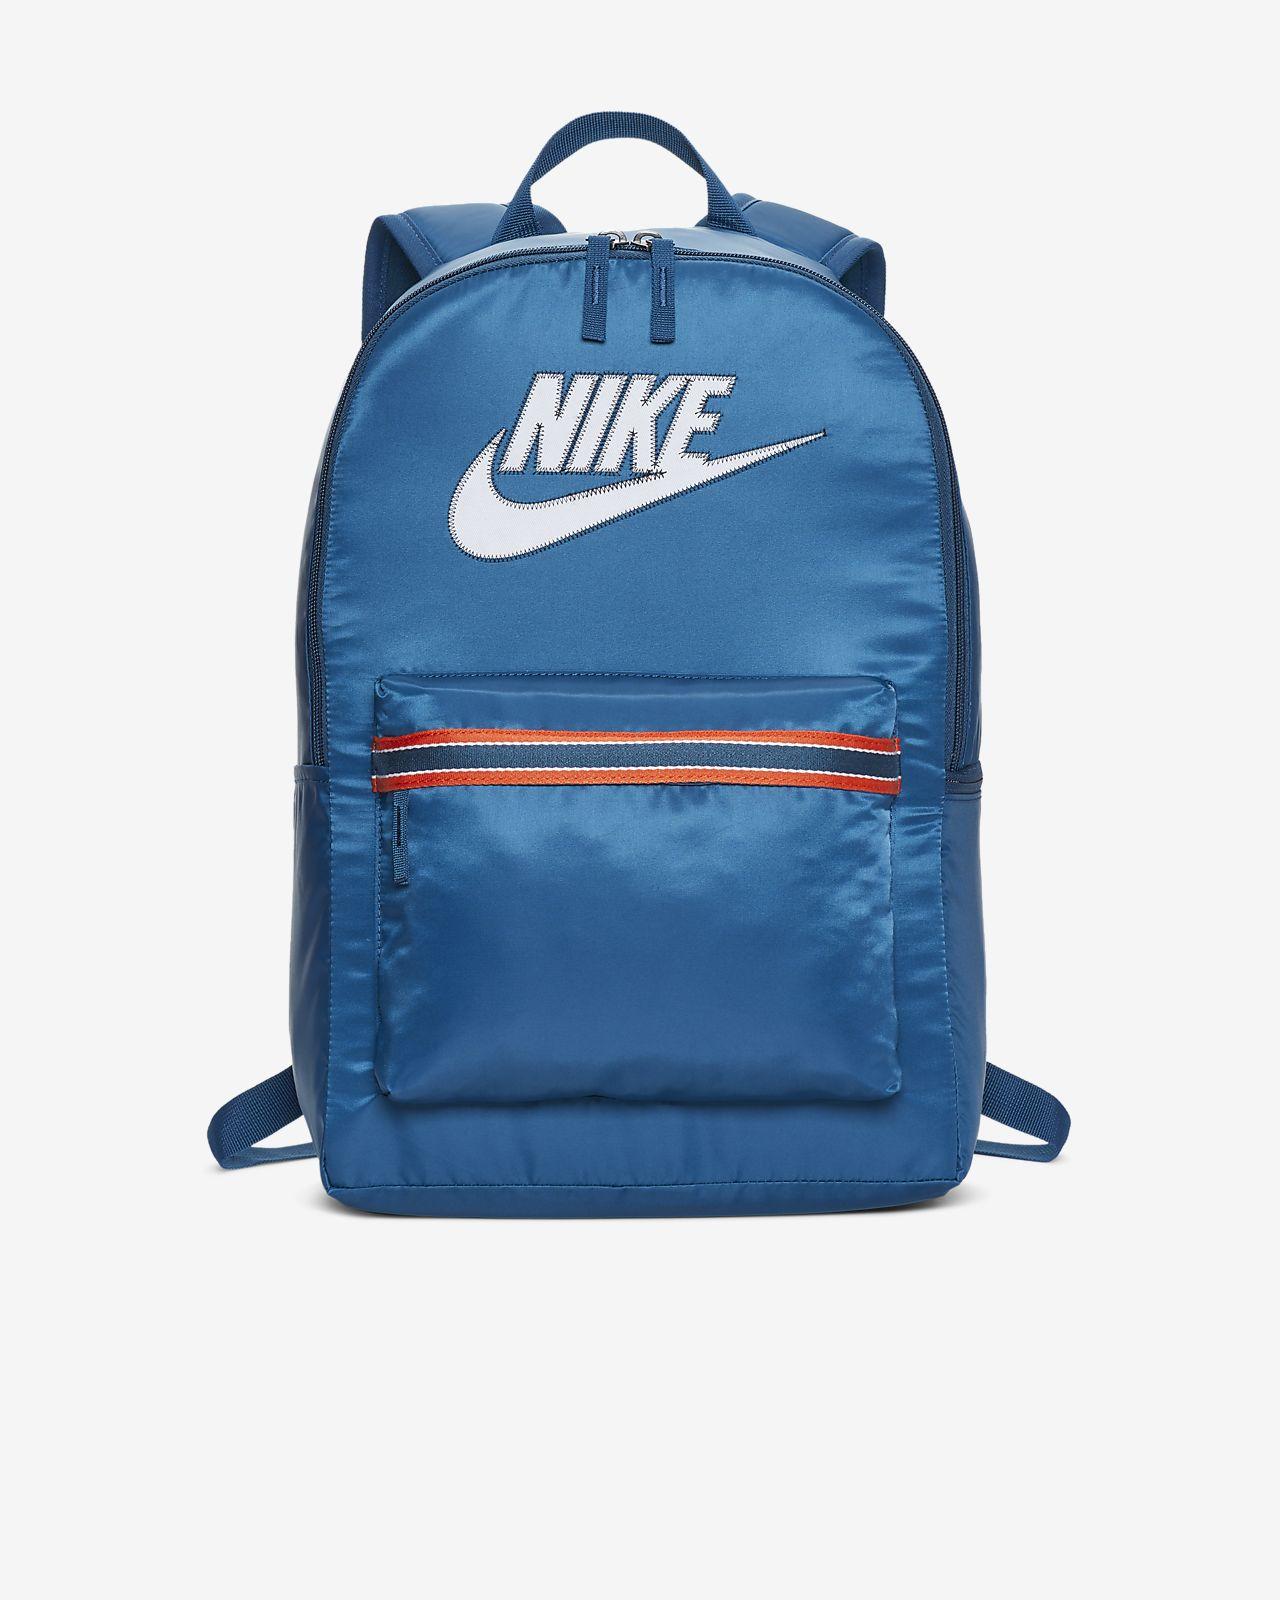 Nike Heritage Jersey Culture Backpack £15.38 @ Nike.com